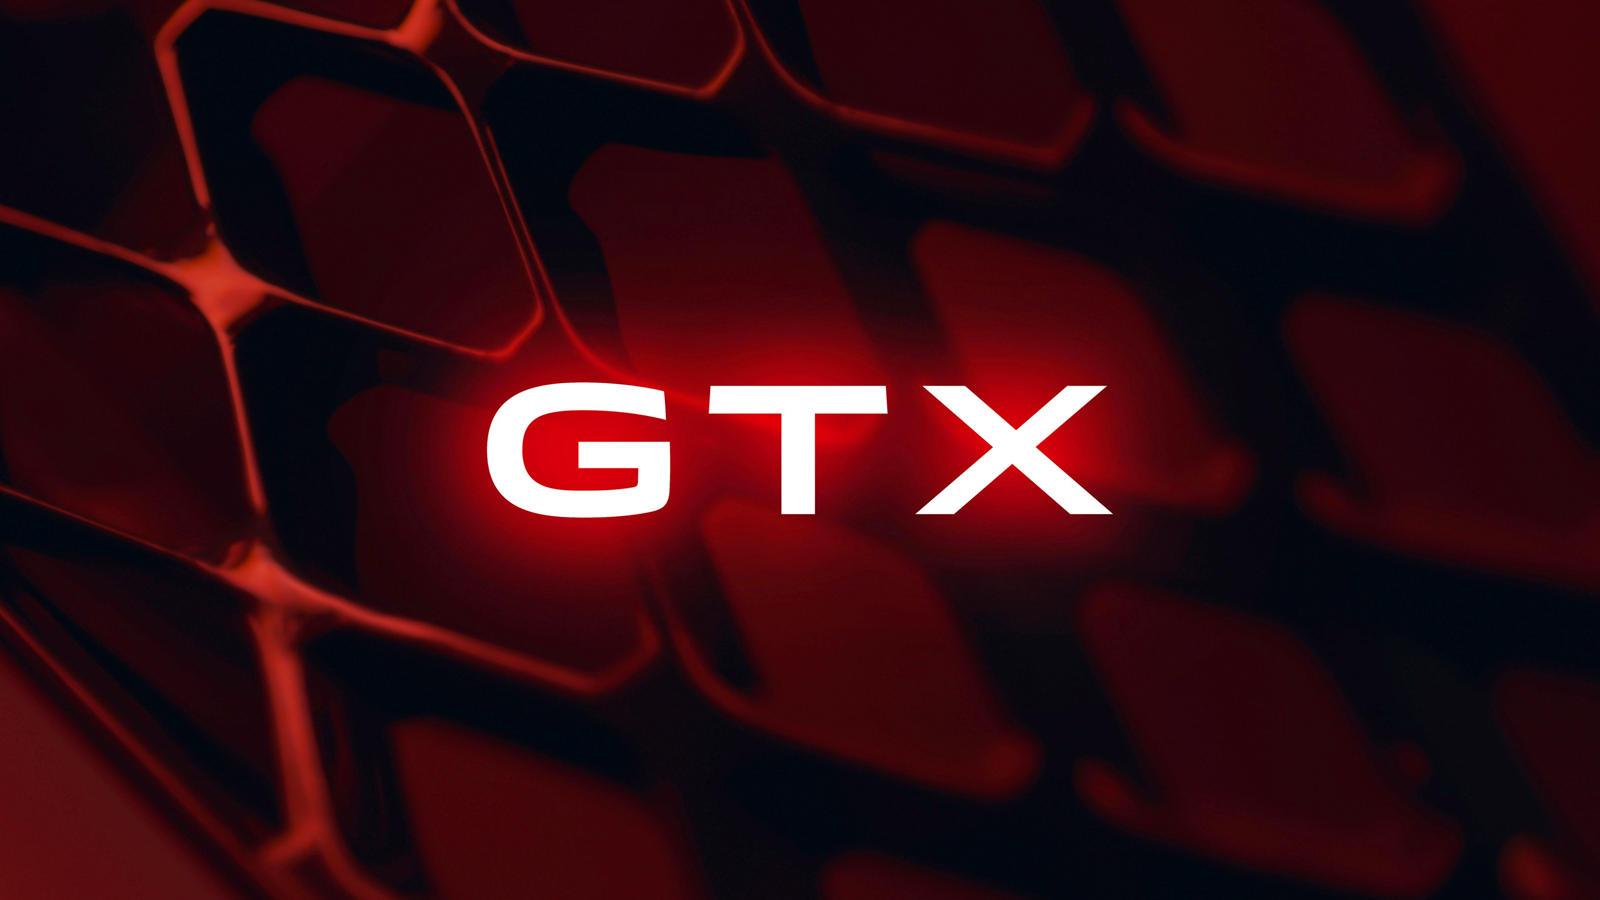 Volkswagen Confirms High-Performance Electric GTX Range